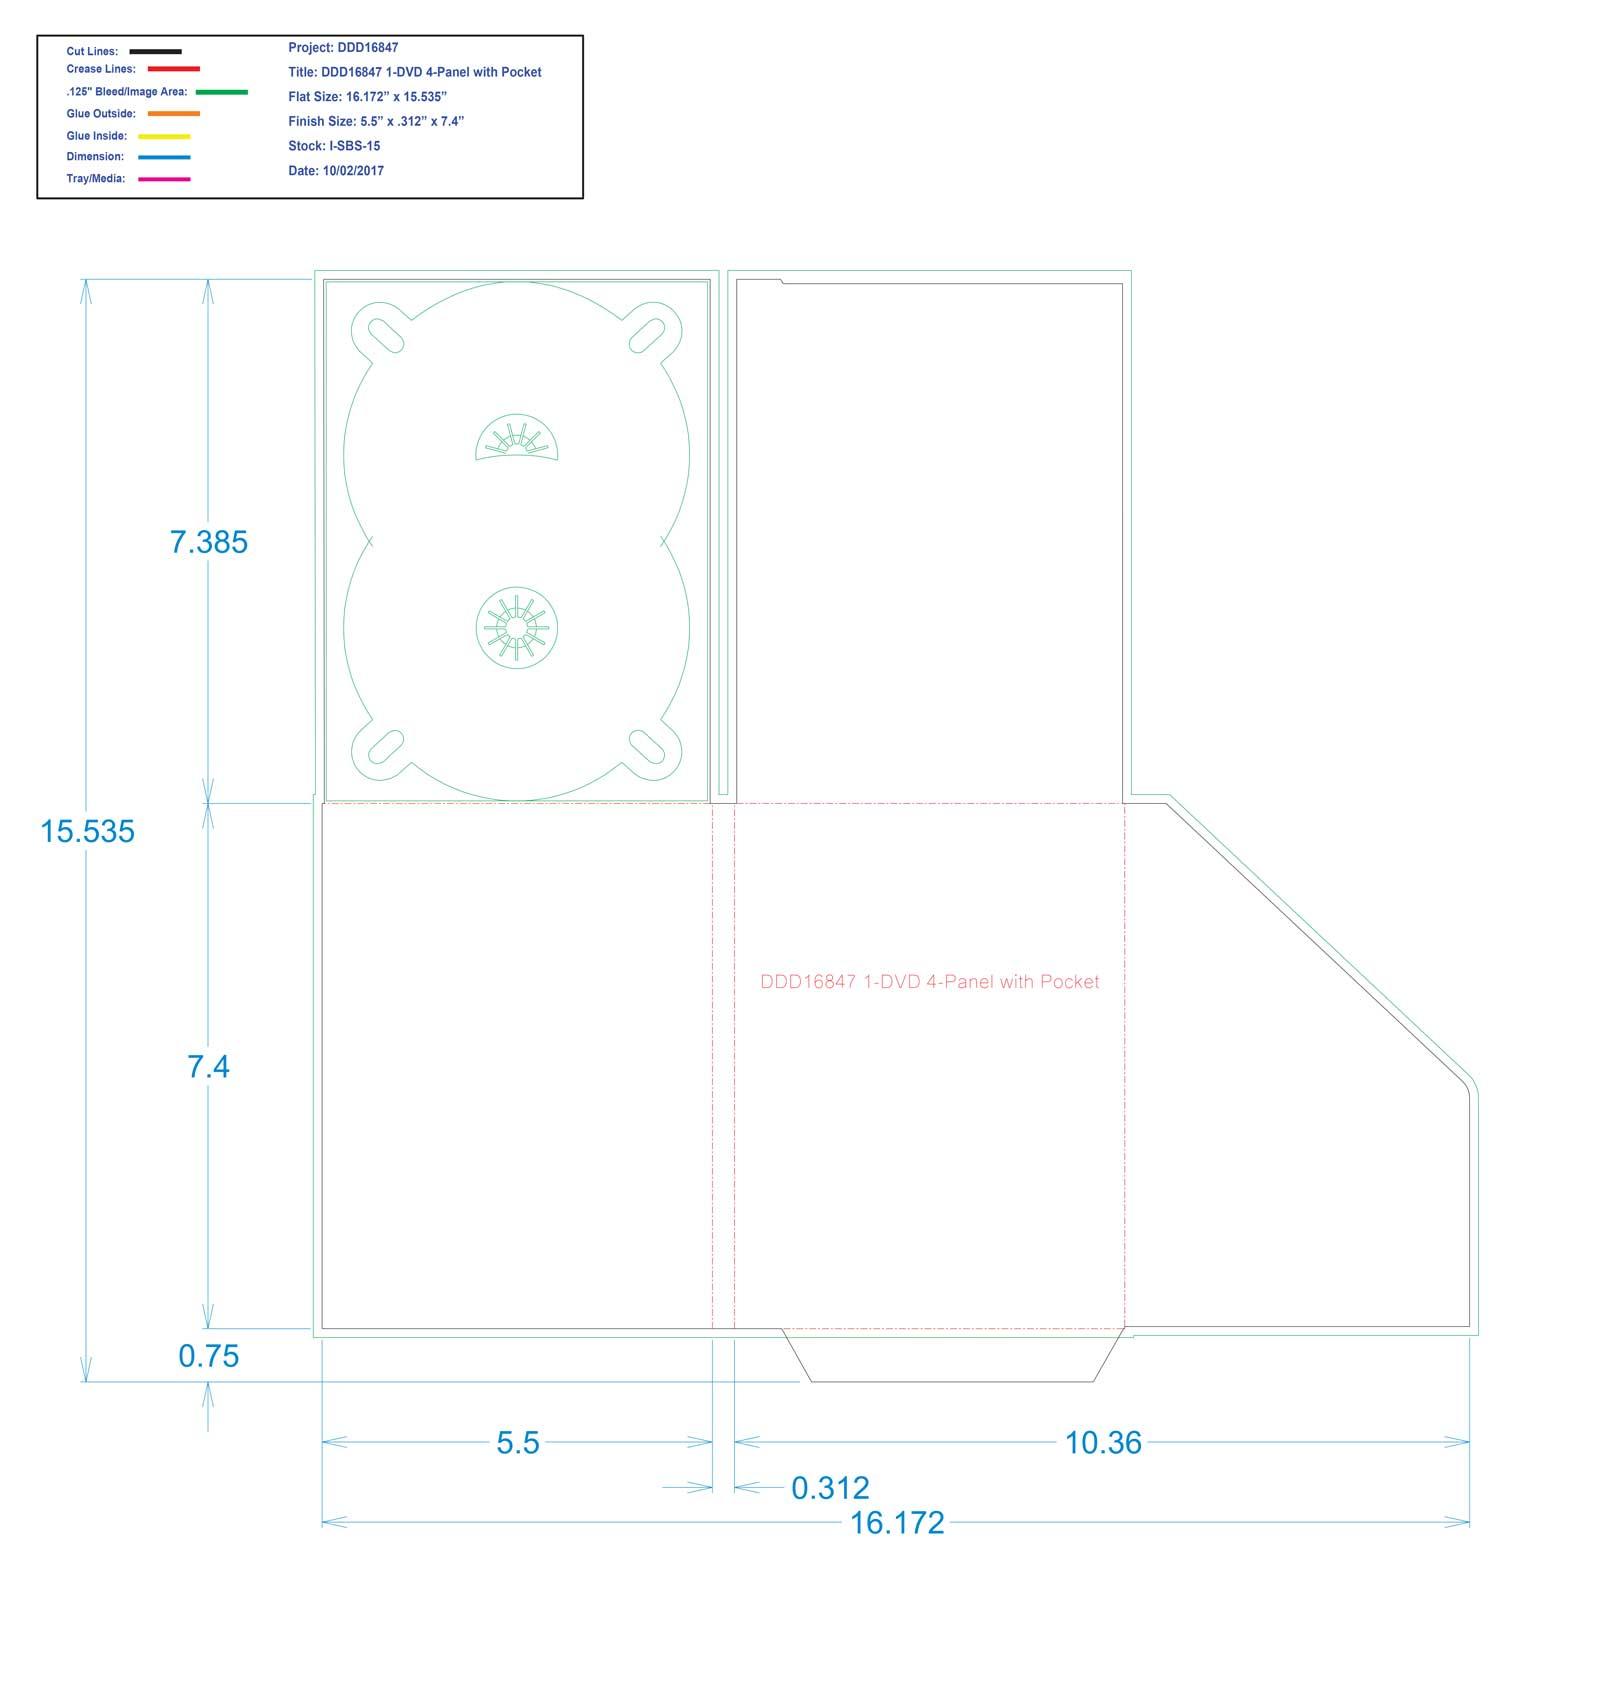 DDD16847 1-DVD 4-Panel with Pocket